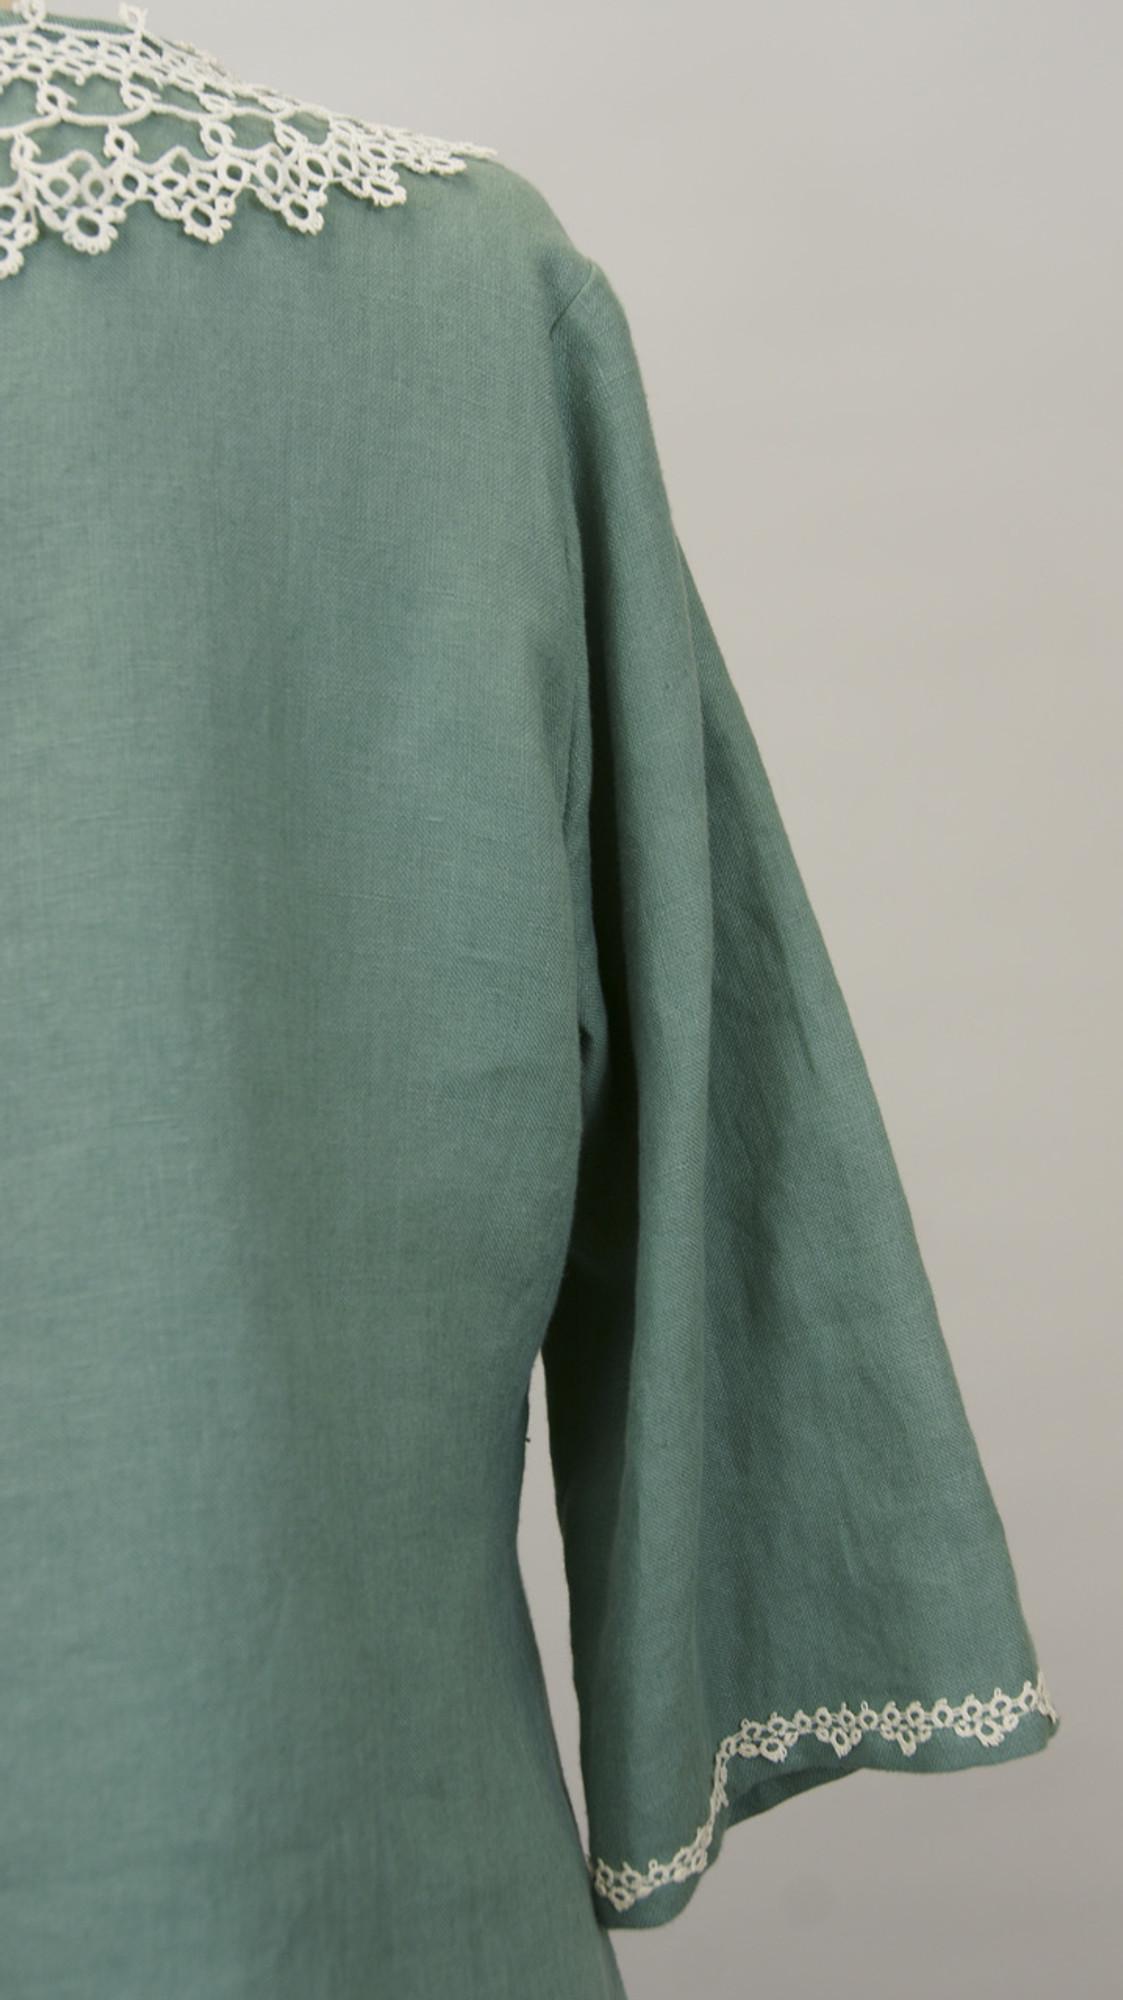 Green Linen Tunic Top (Size Xlarge)